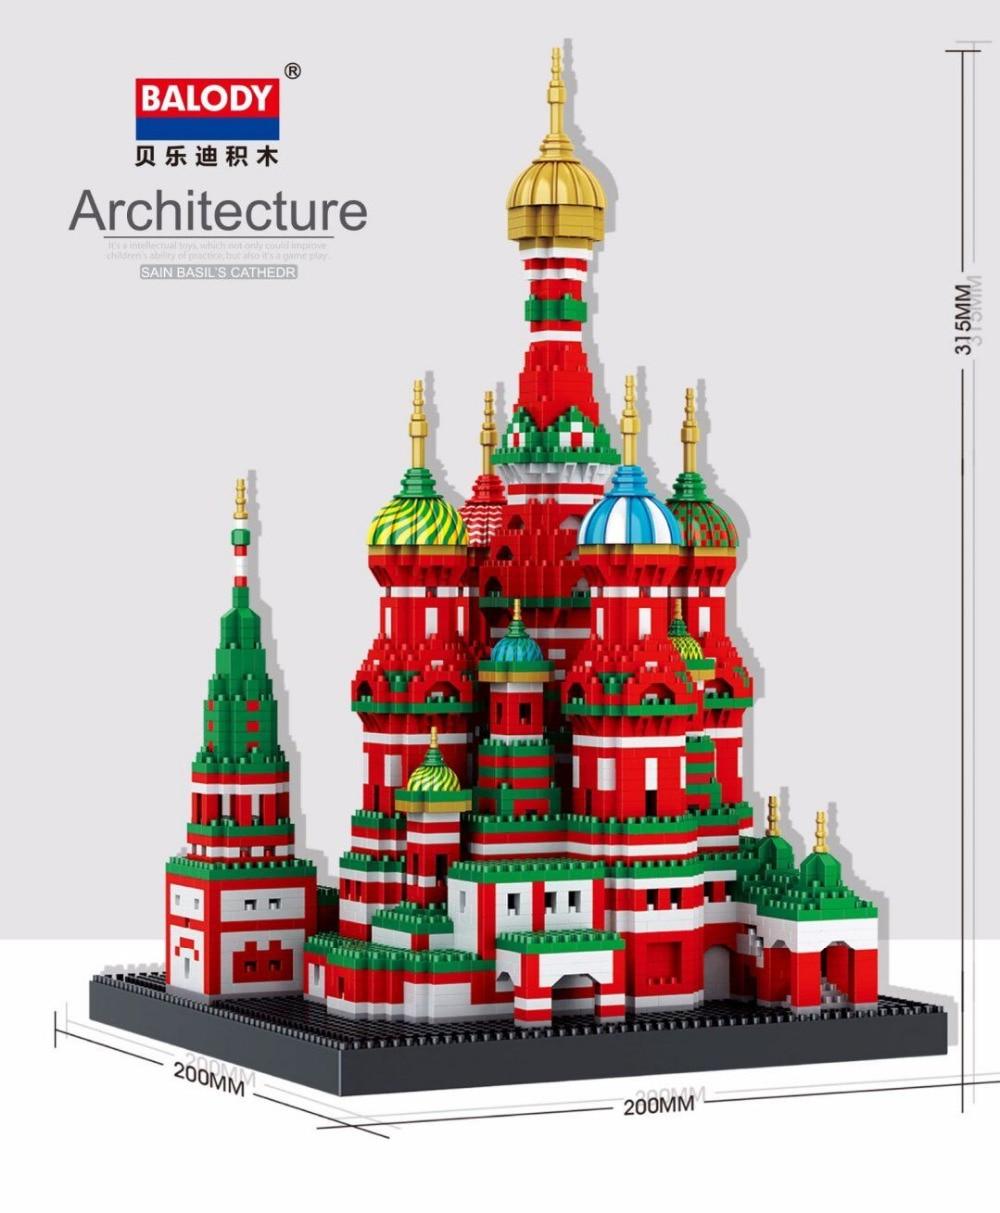 Balody Mini Blocks Building World Architecture Saint Basil's Cathedral brinquedos Plastic Bricks Kids toys for kids Gifts 16066 часы mini world mn1012a